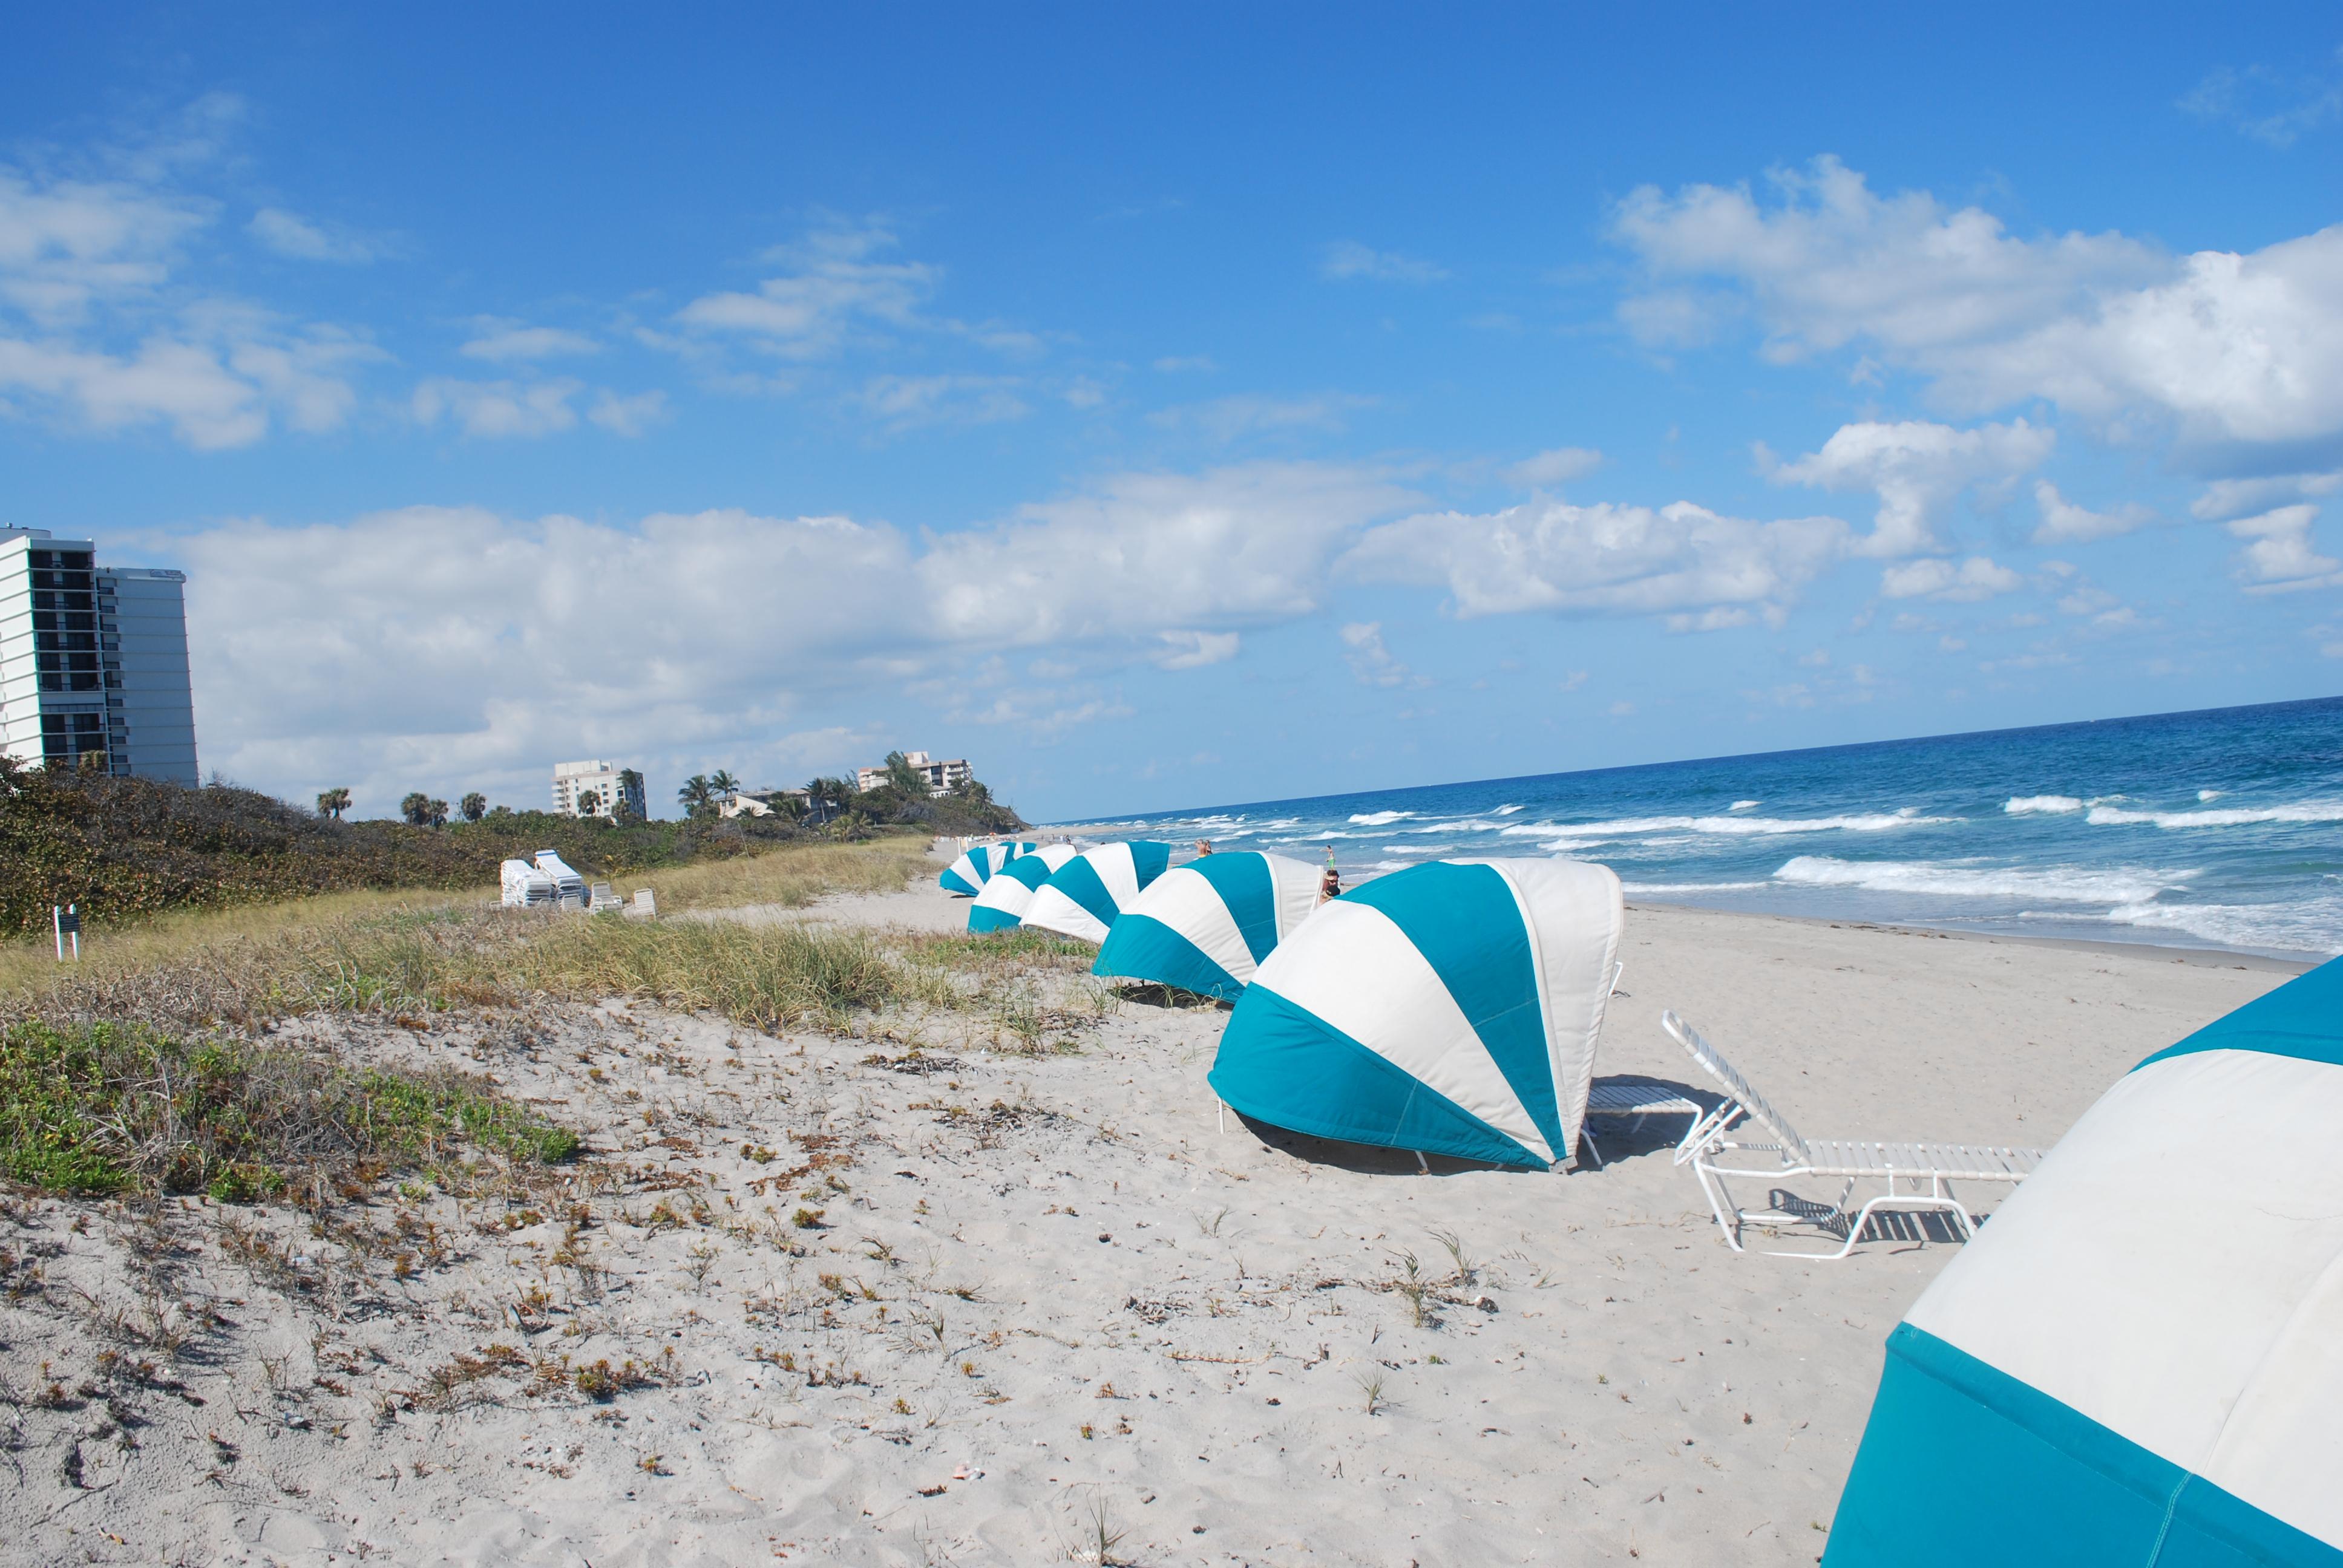 Looking_south_on_beach_at_Boca_Raton,_Florida